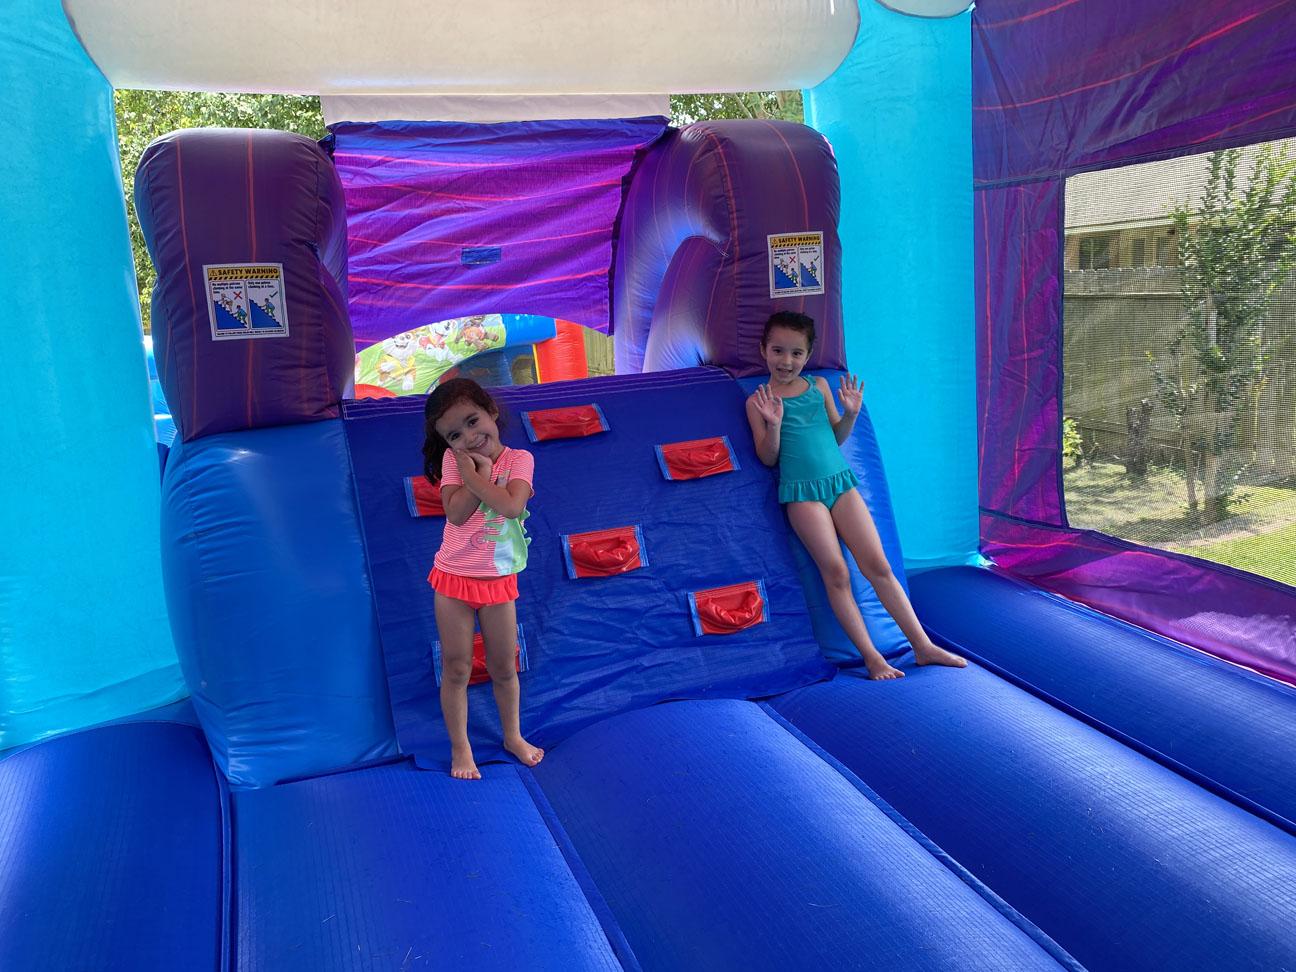 Frozen 2 Water Slides Bounce House Rentals Delivered